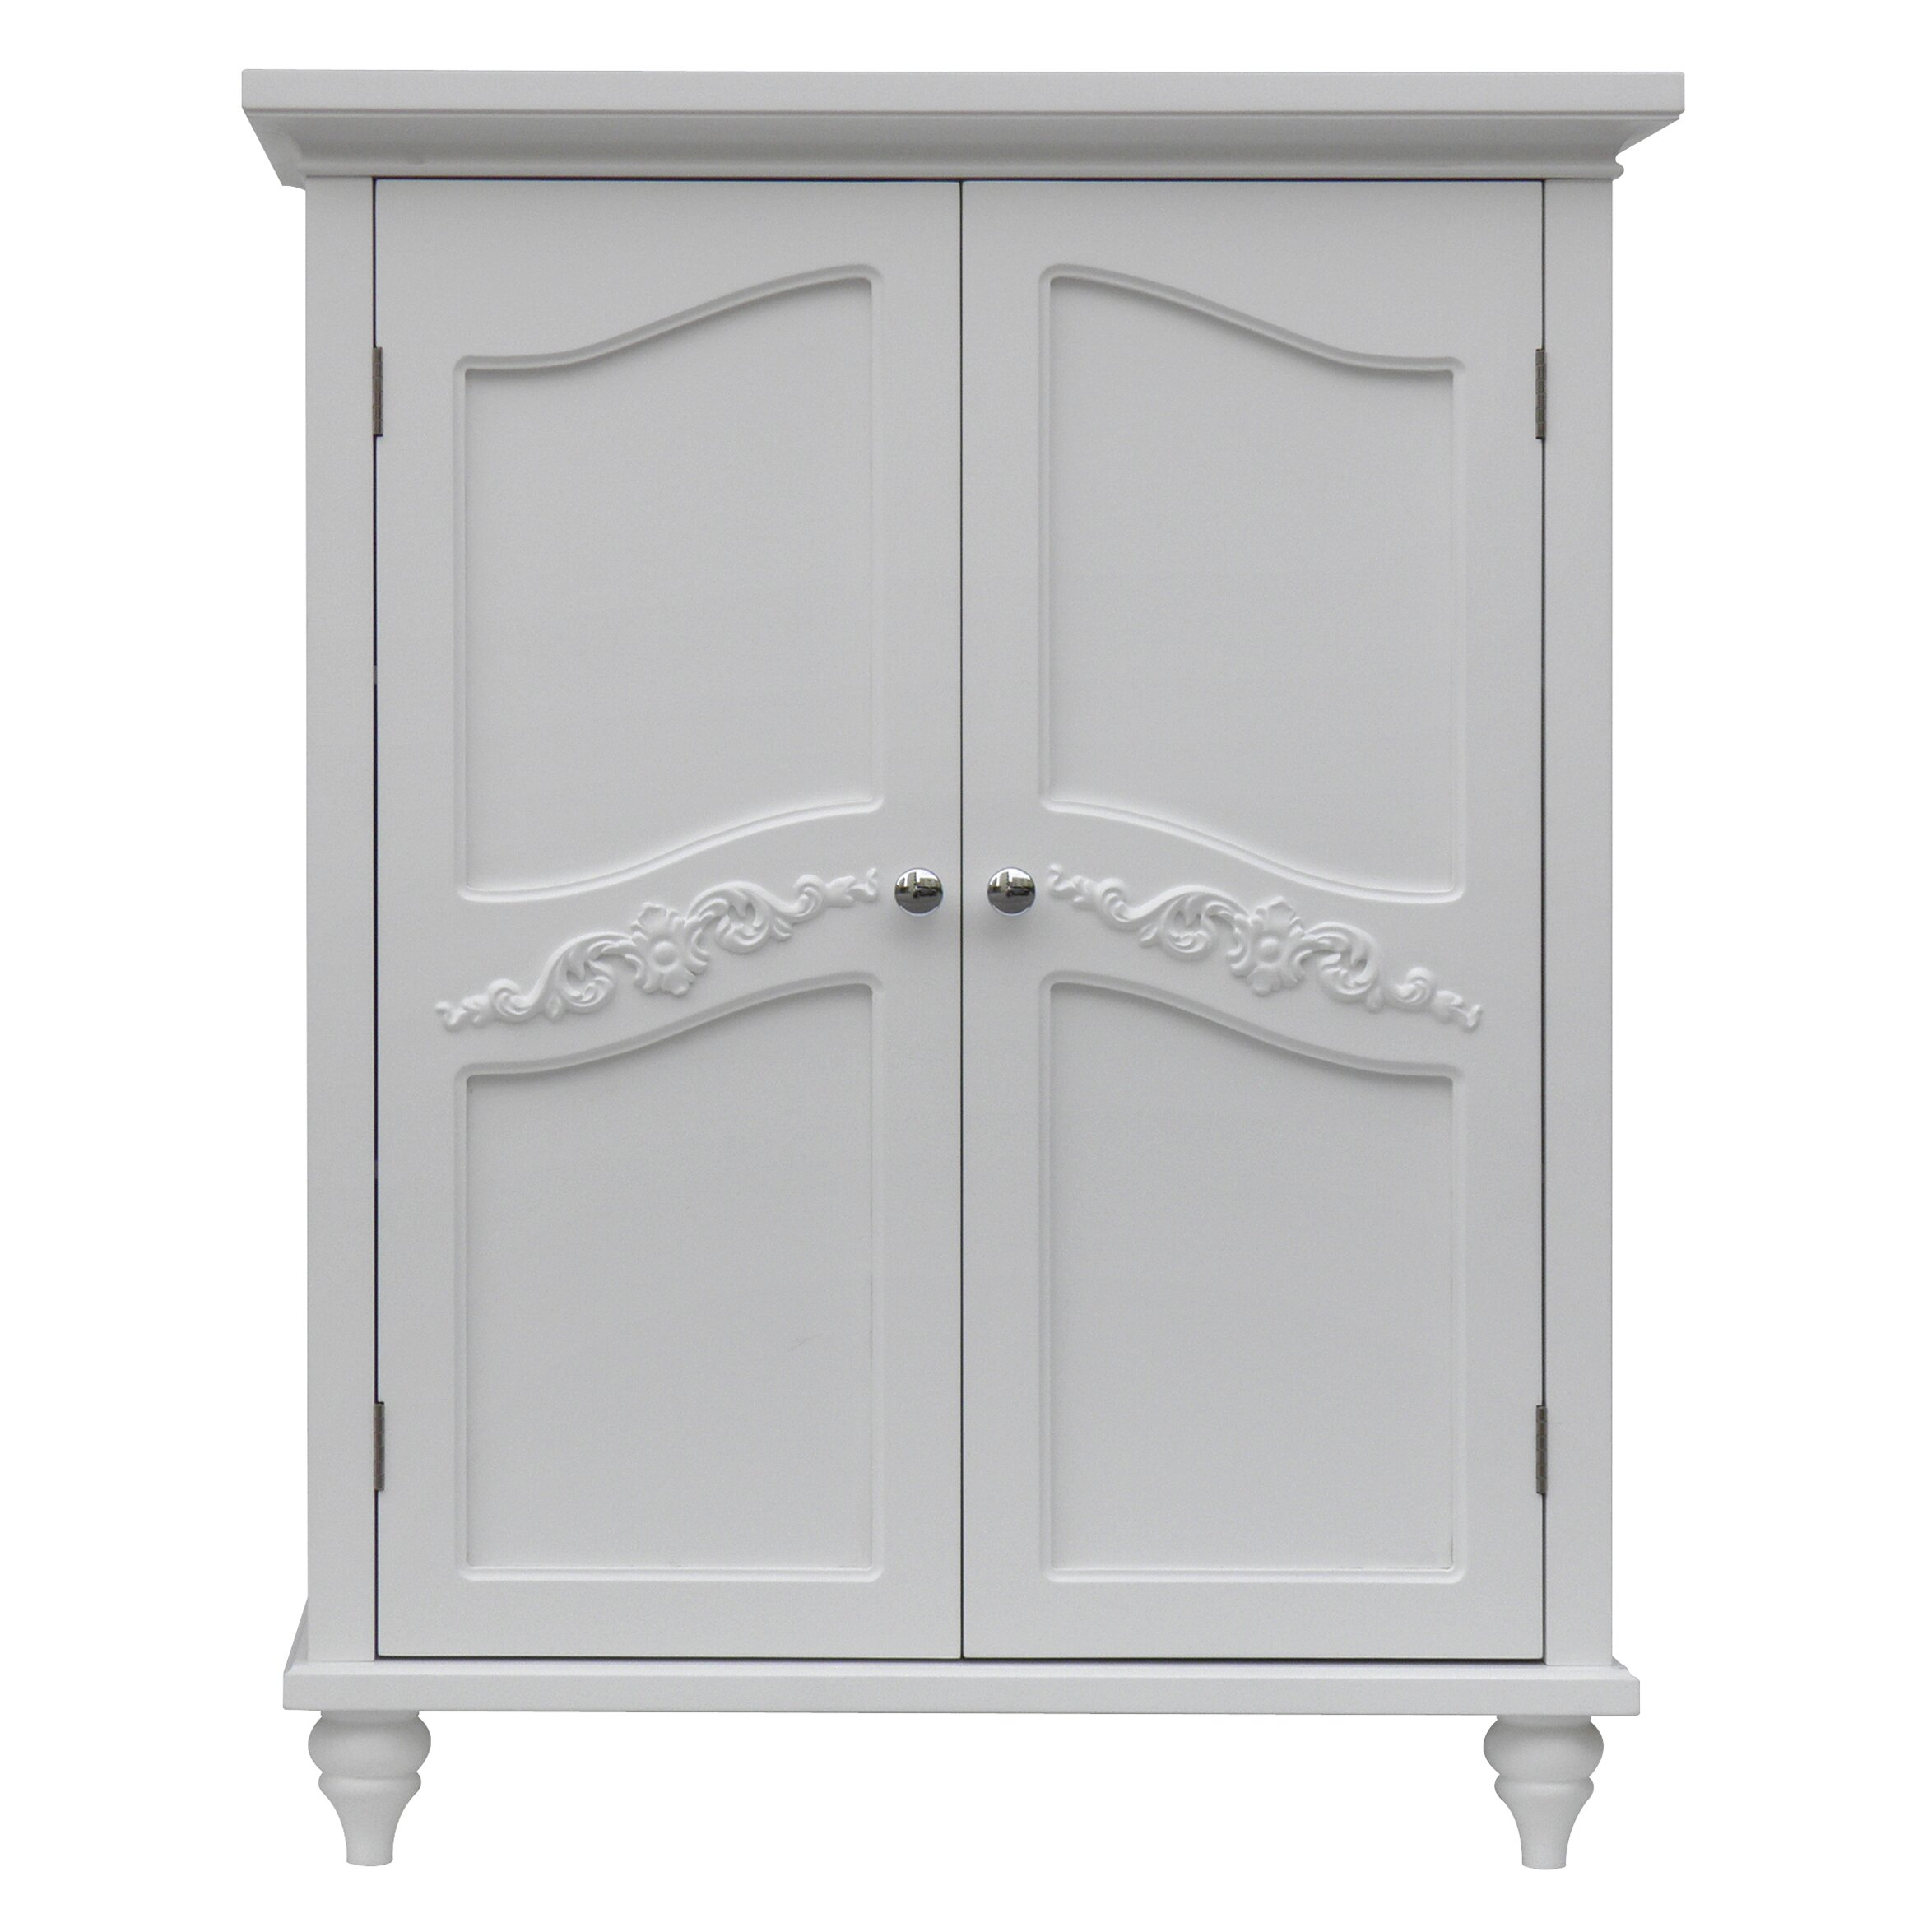 "Wayfair Free Standing Kitchen Cabinets: Elegant Home Fashions Versailles 27"" X 34"" Free Standing"